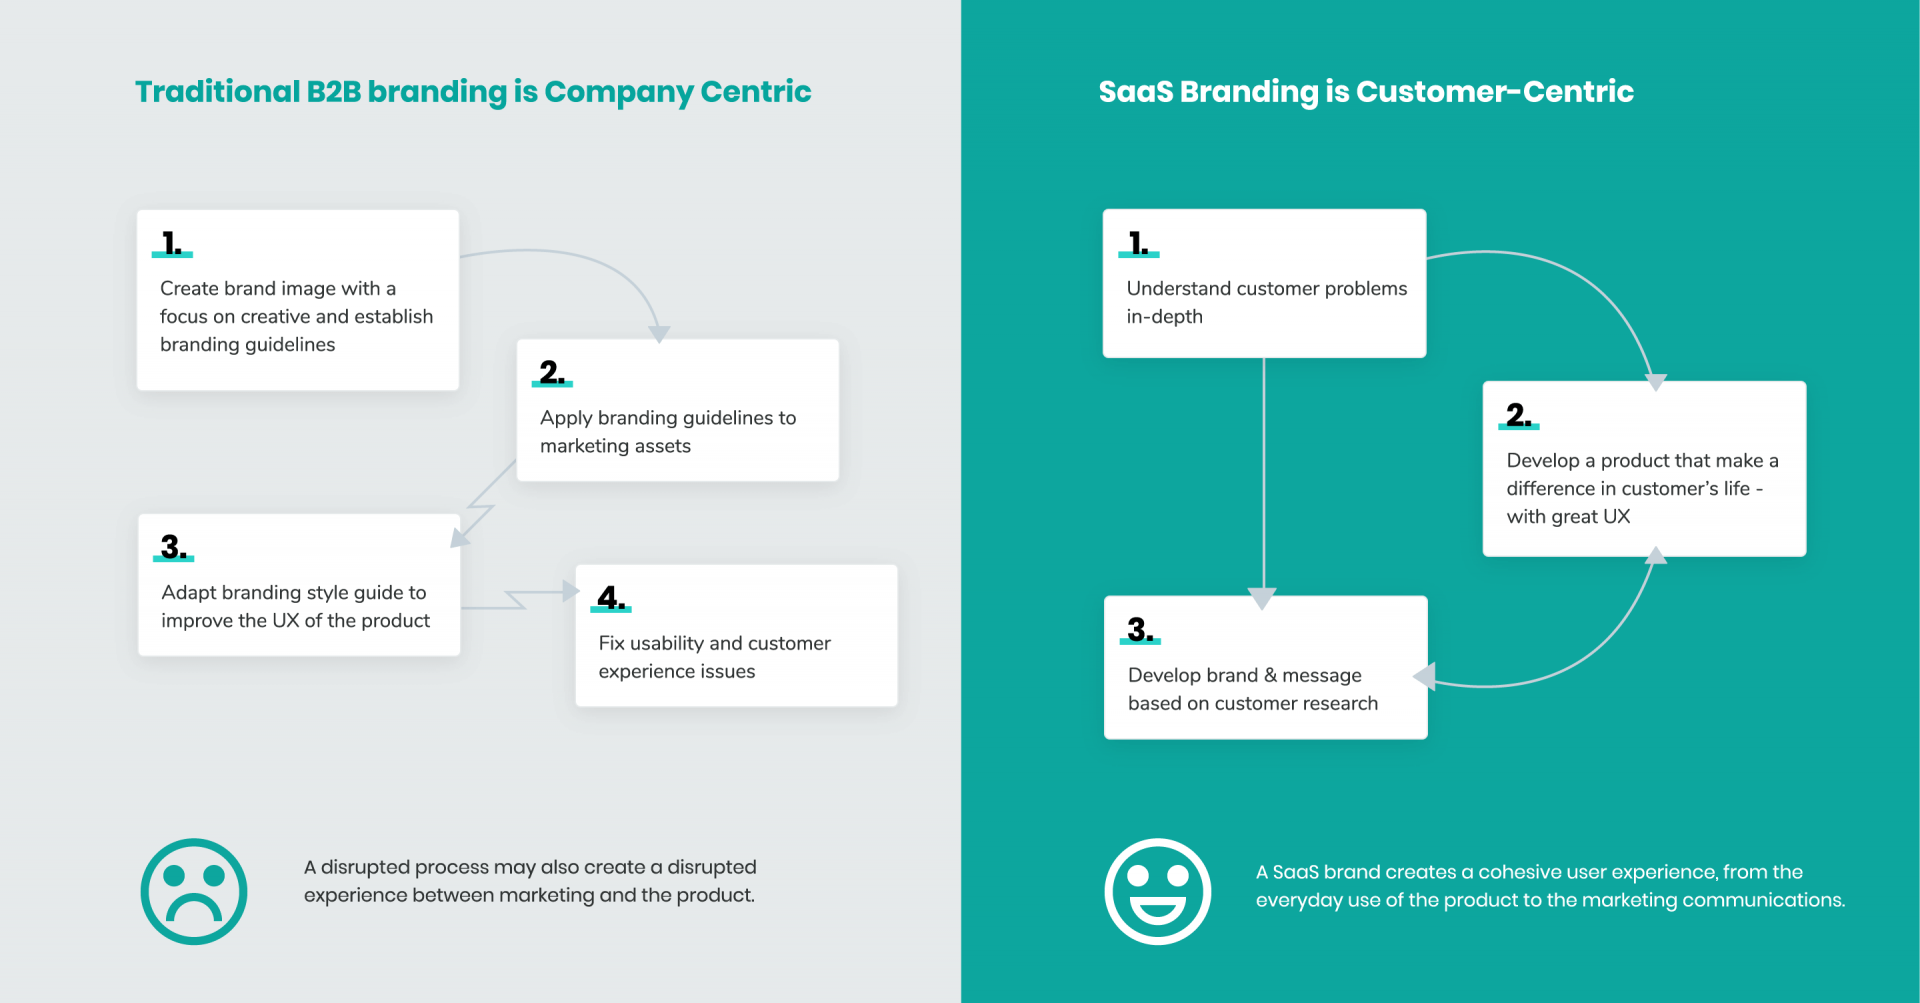 saas-marketing--traditional-saas-branding_2x.png